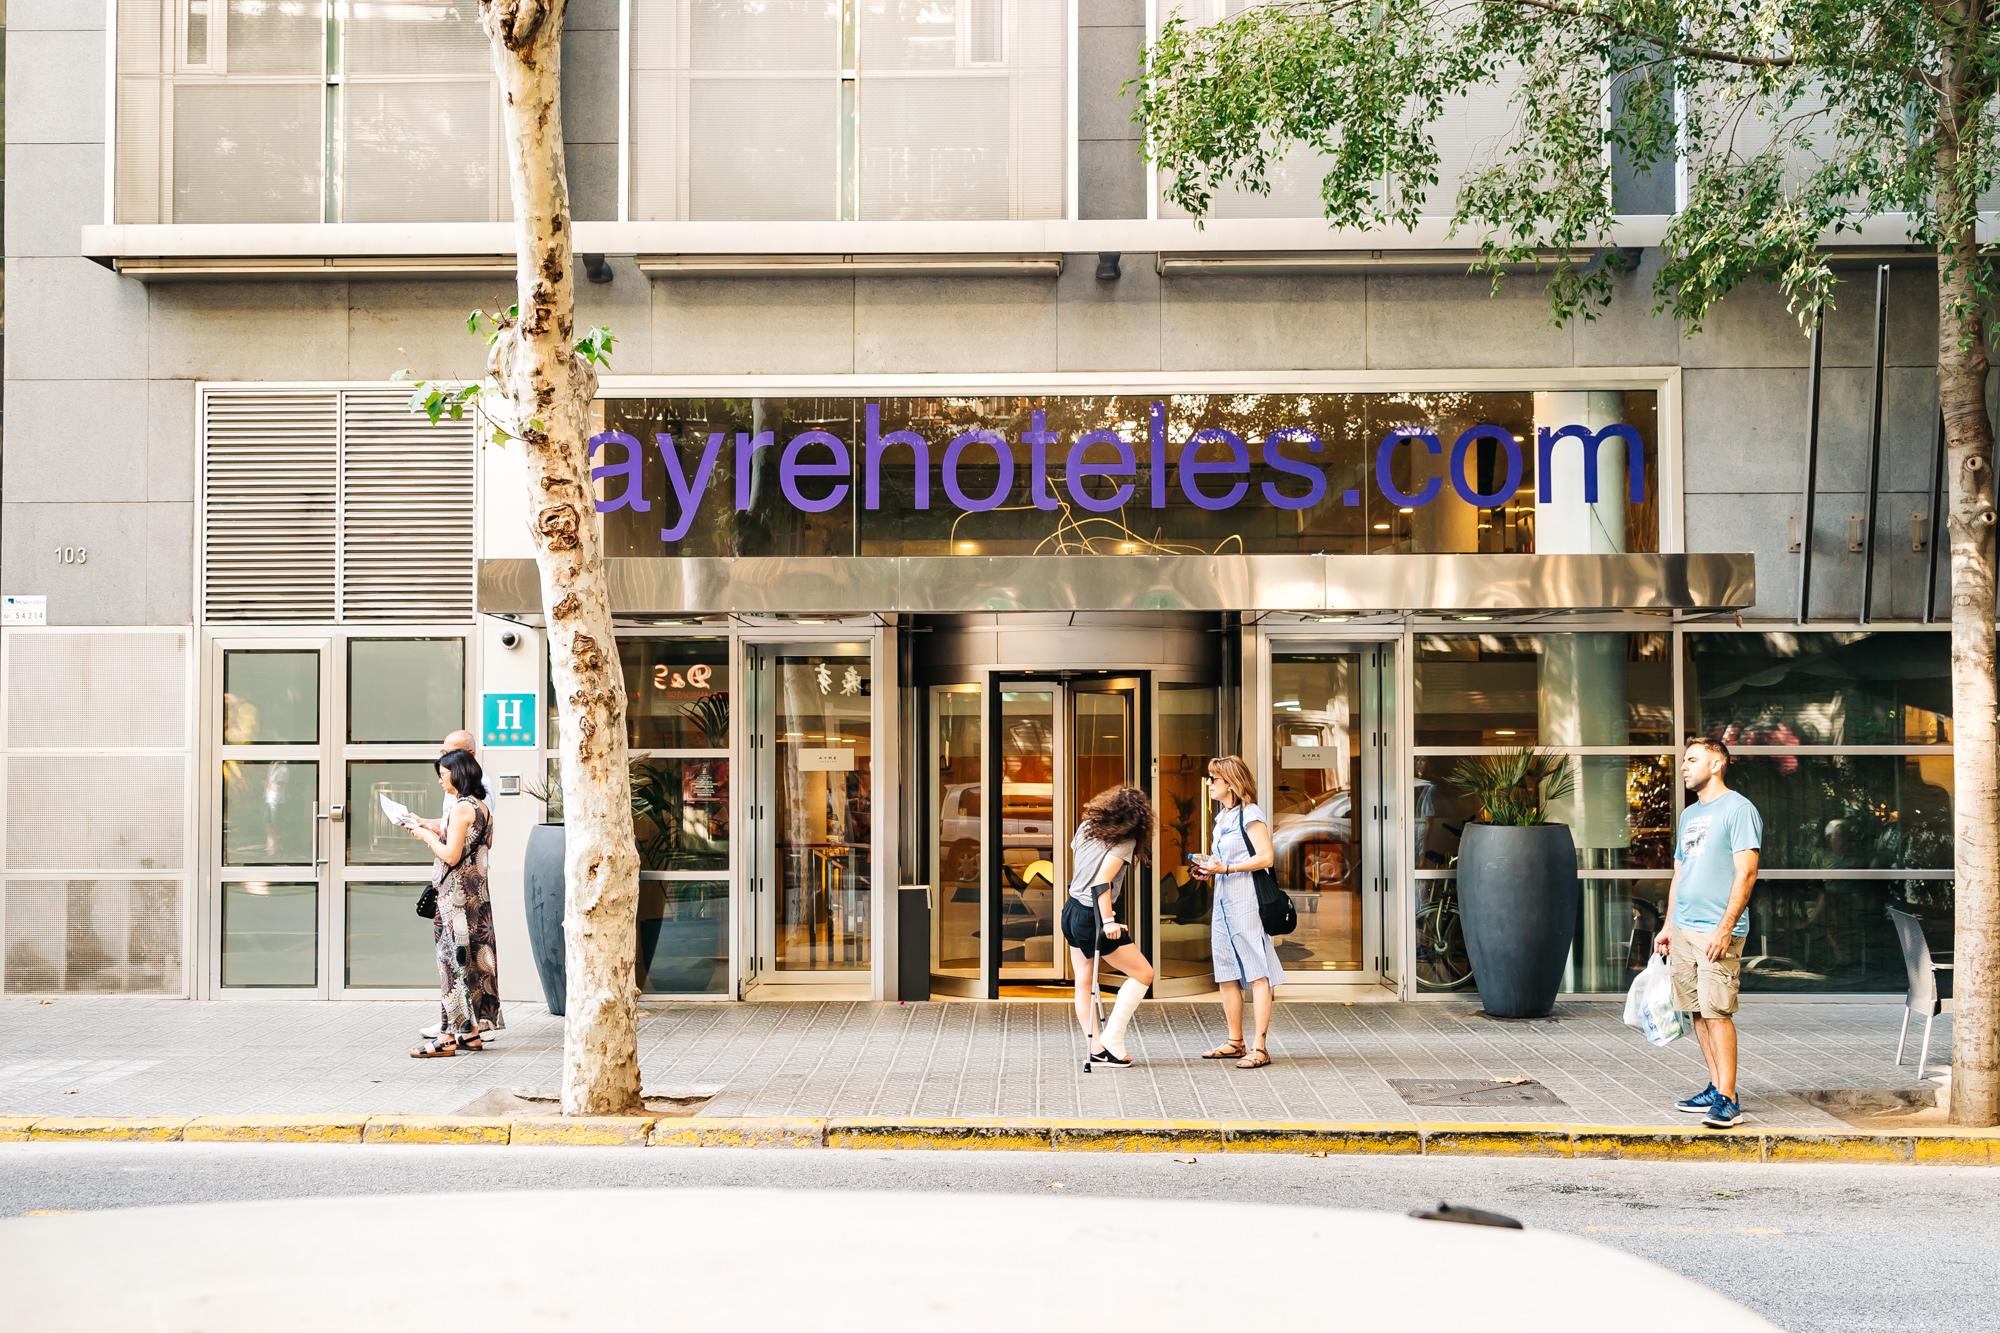 Ayre Hotel Caspe entrance in Barcelona